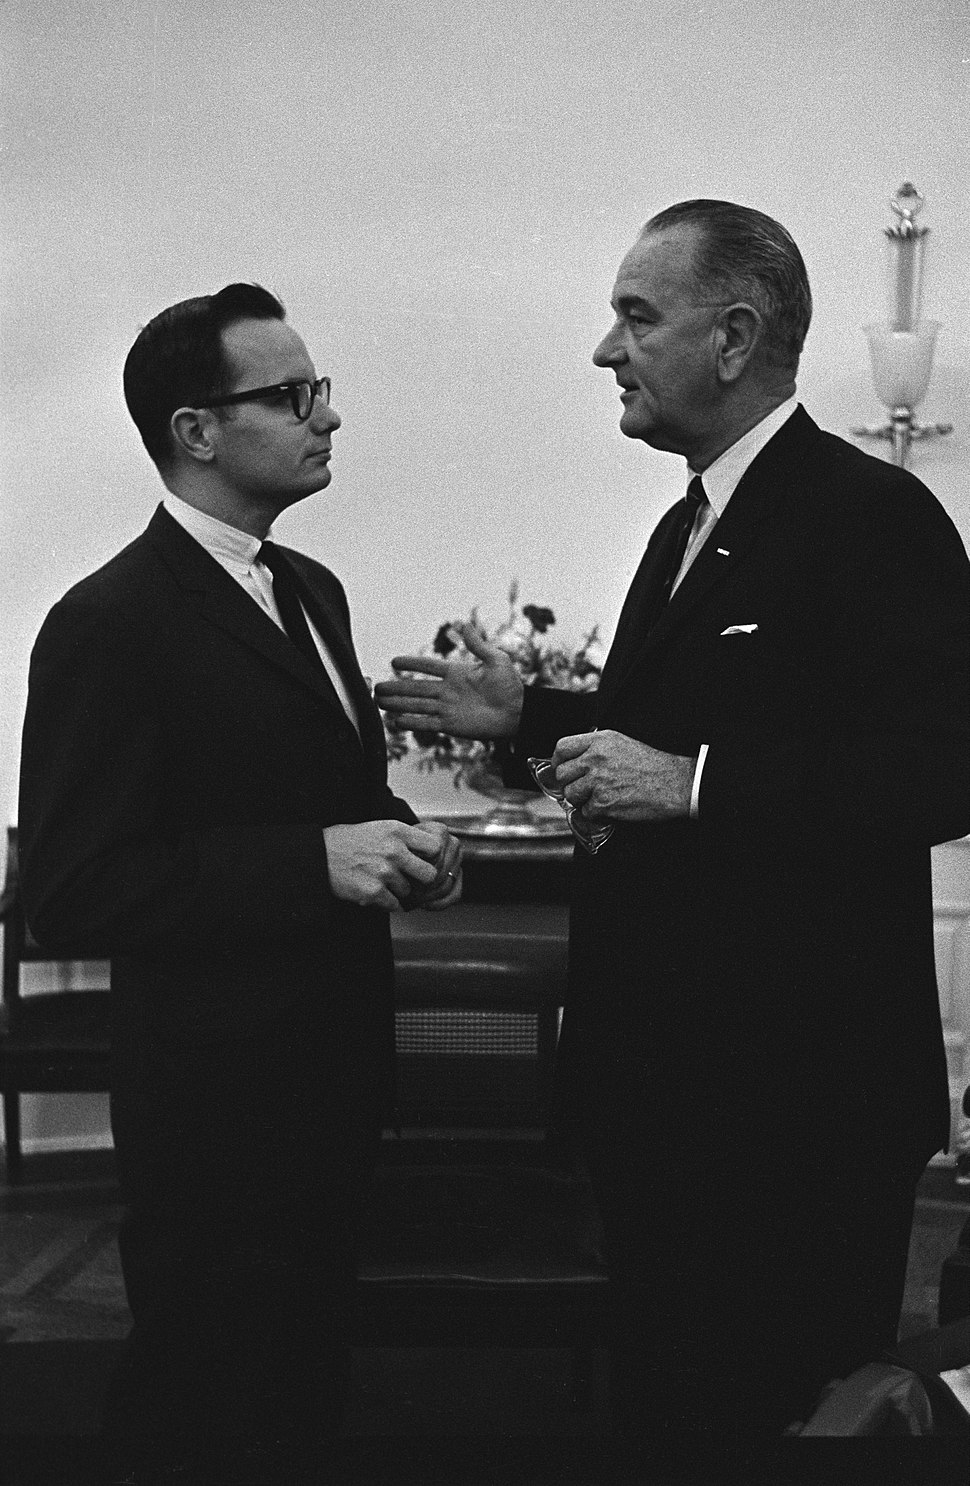 BillMoyers LBJ 1963B